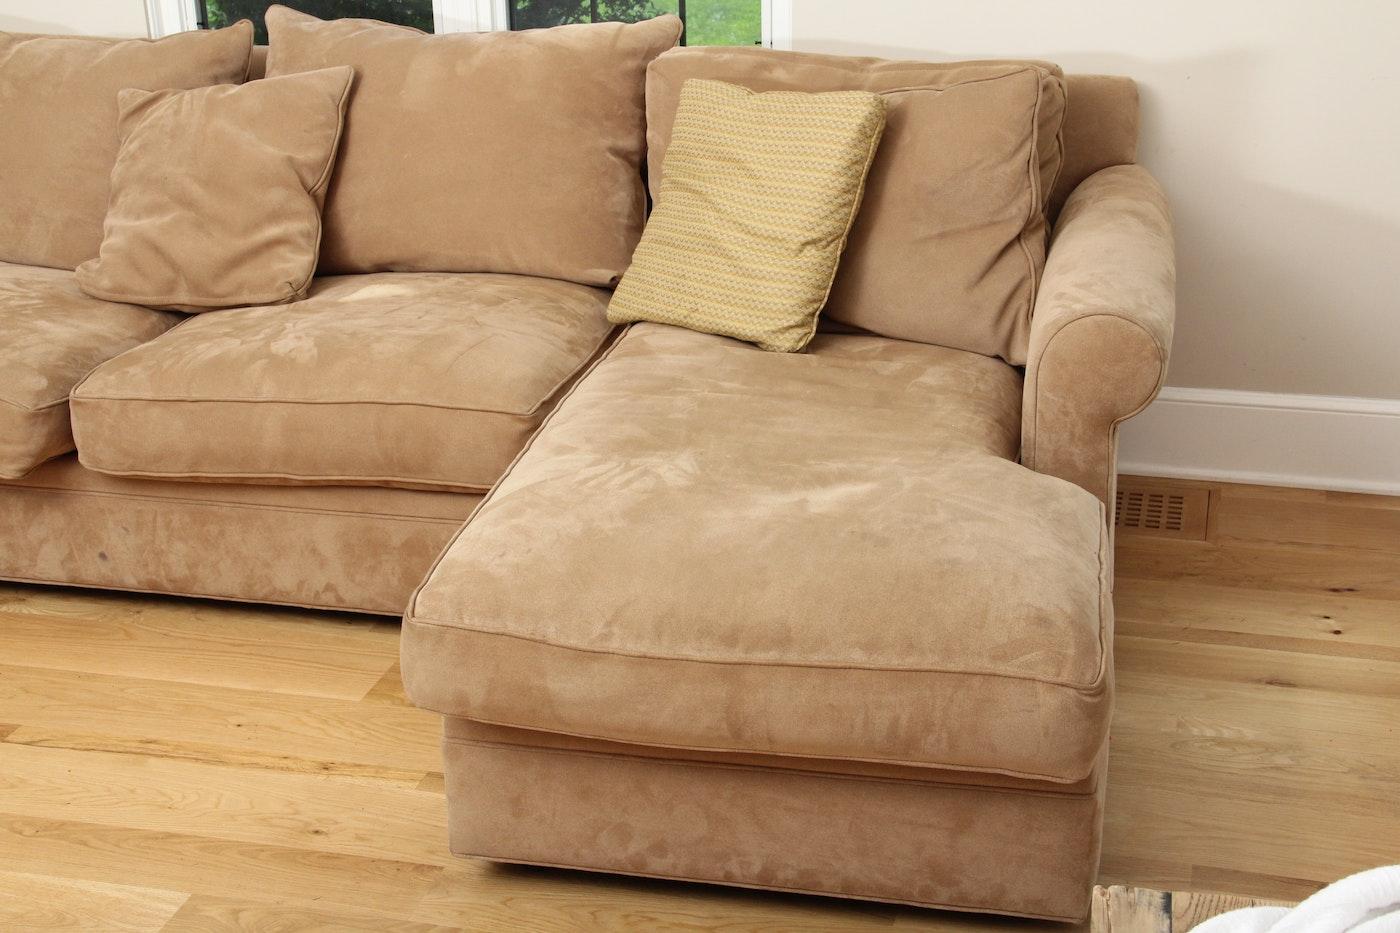 Macy S Modern Concepts Sectional Sofa Ebth